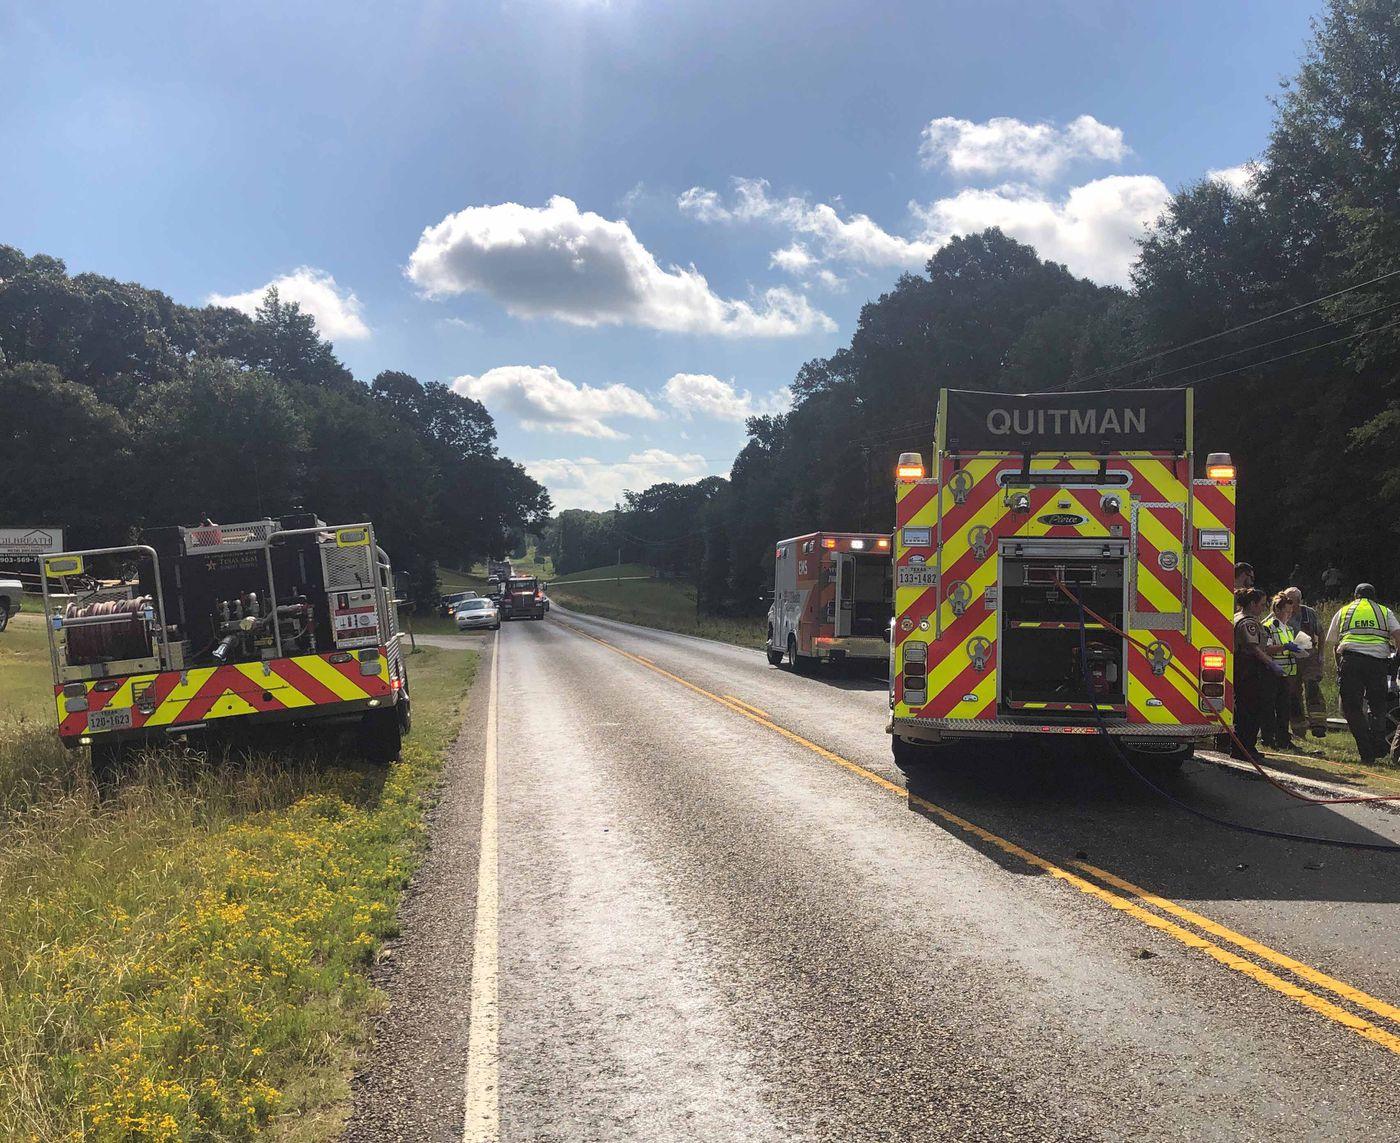 Four hospitalized following fiery wreck near Quitman